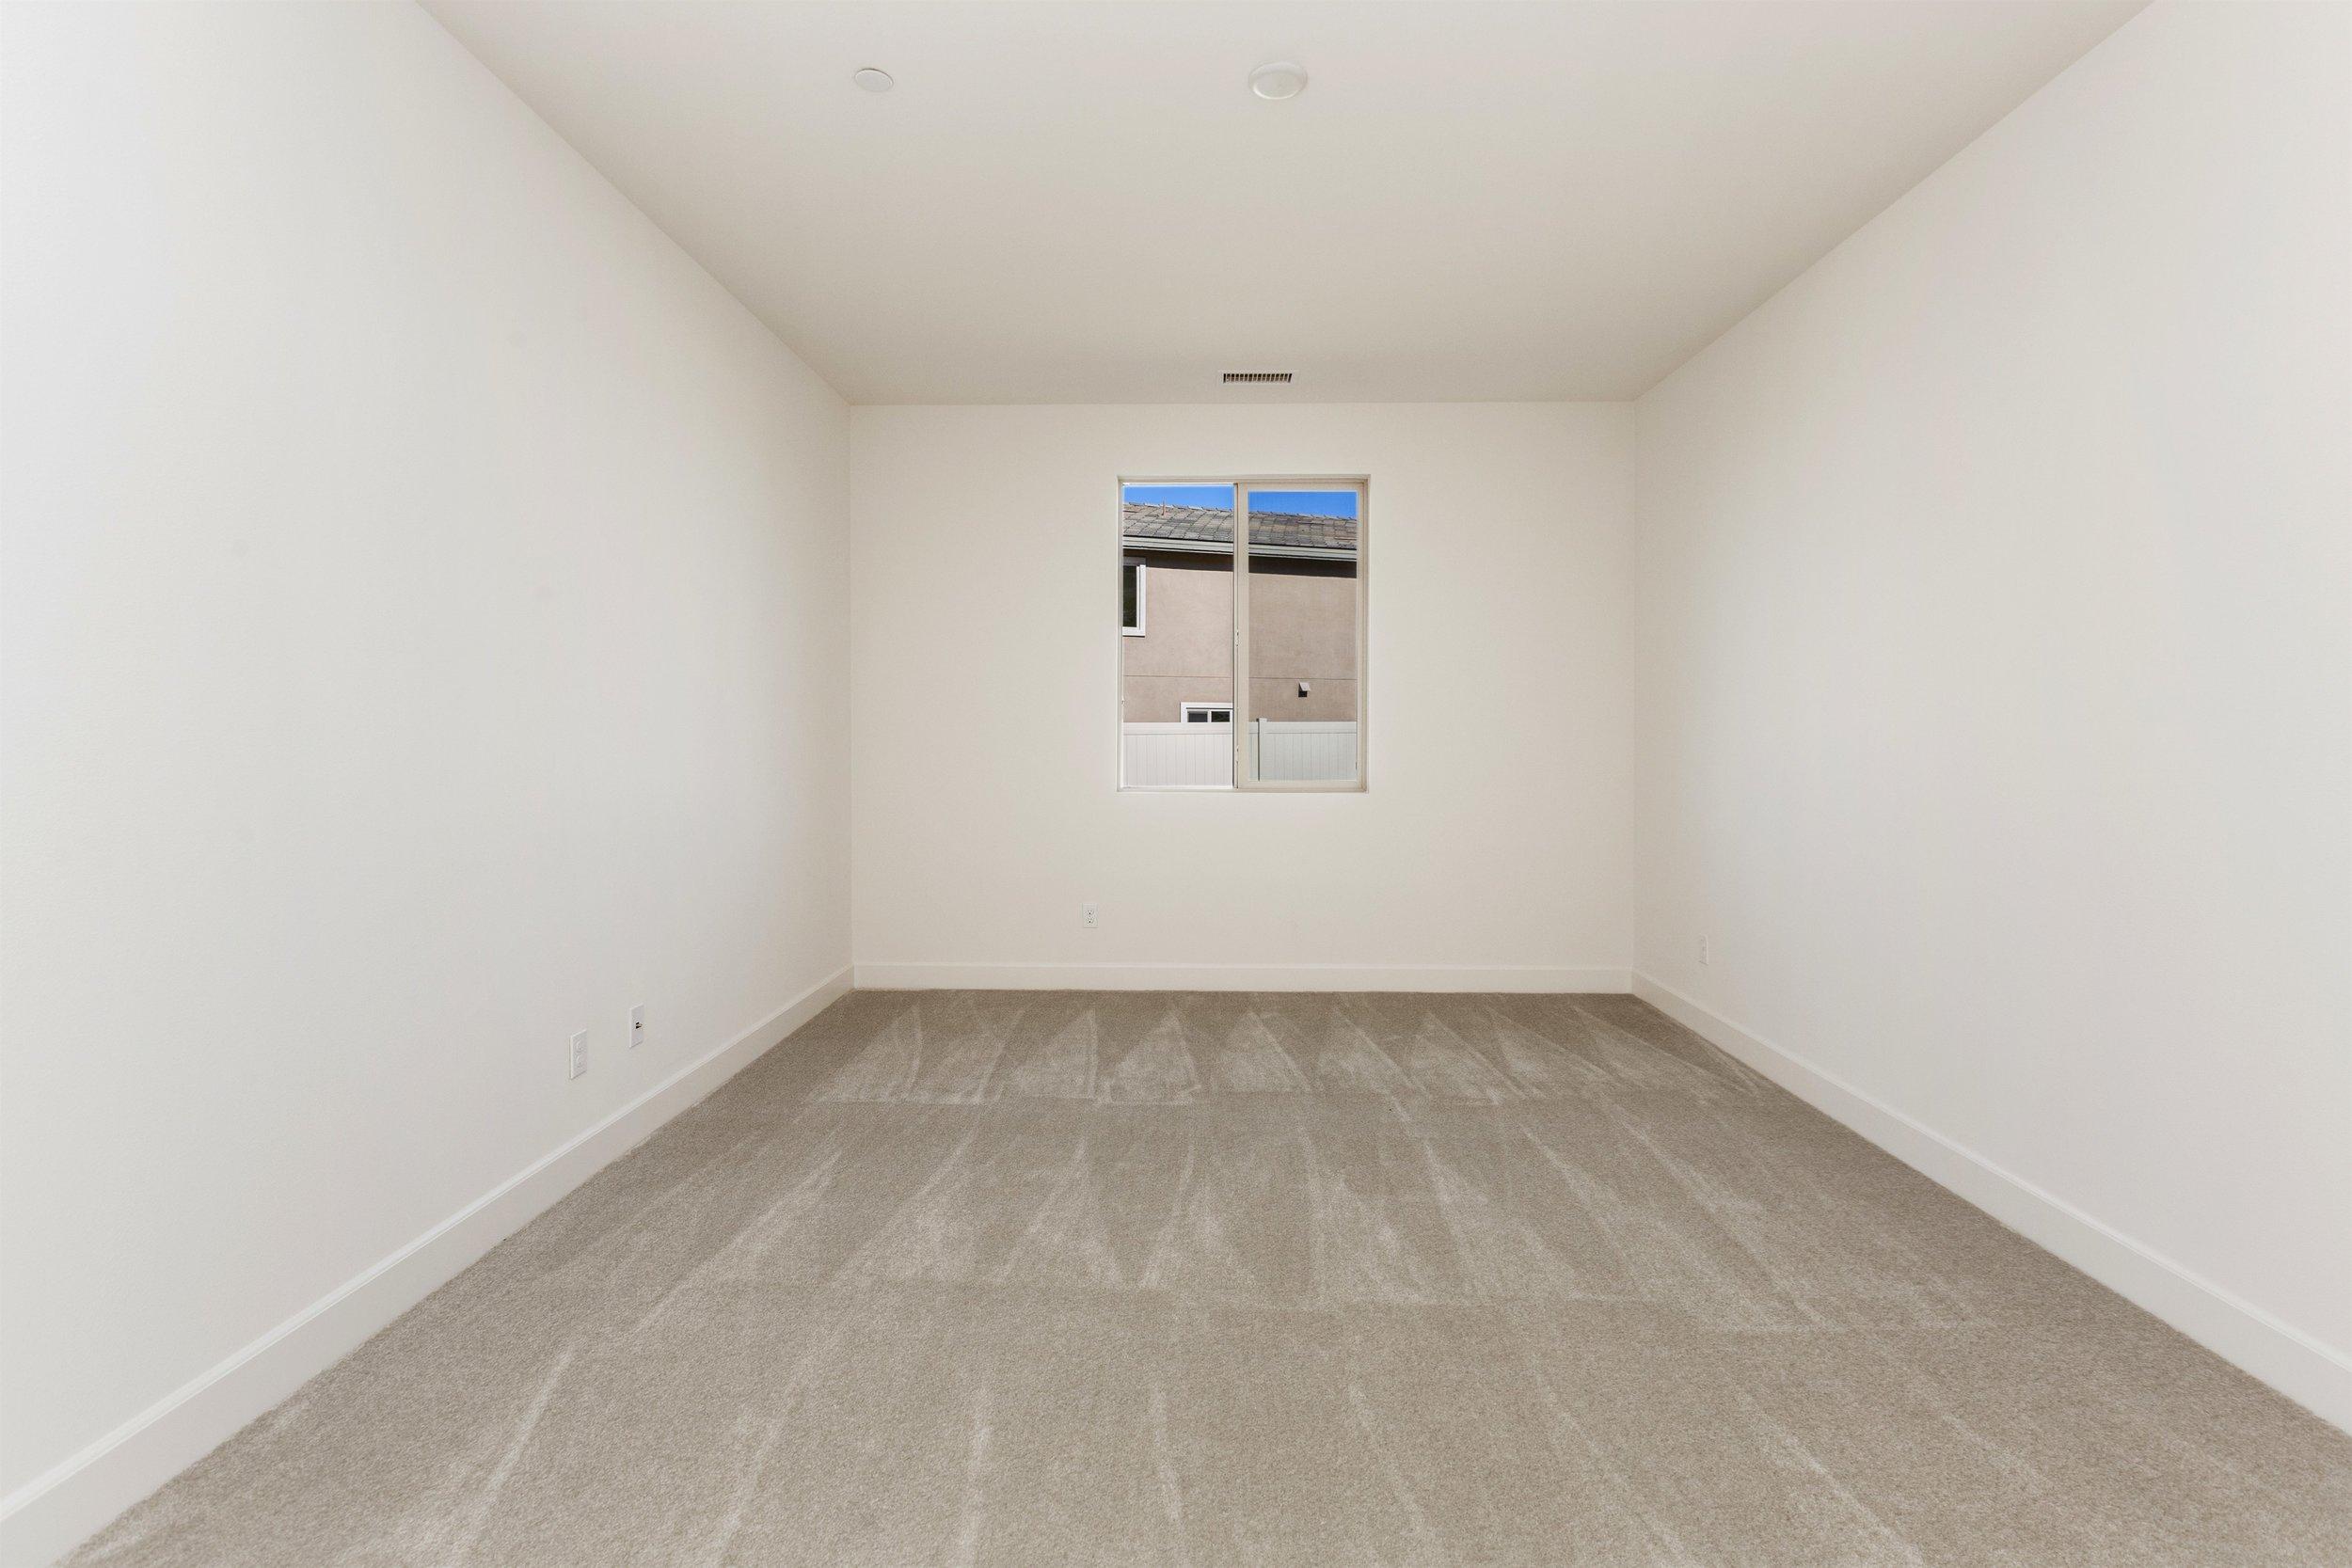 039_Bedroom.jpg